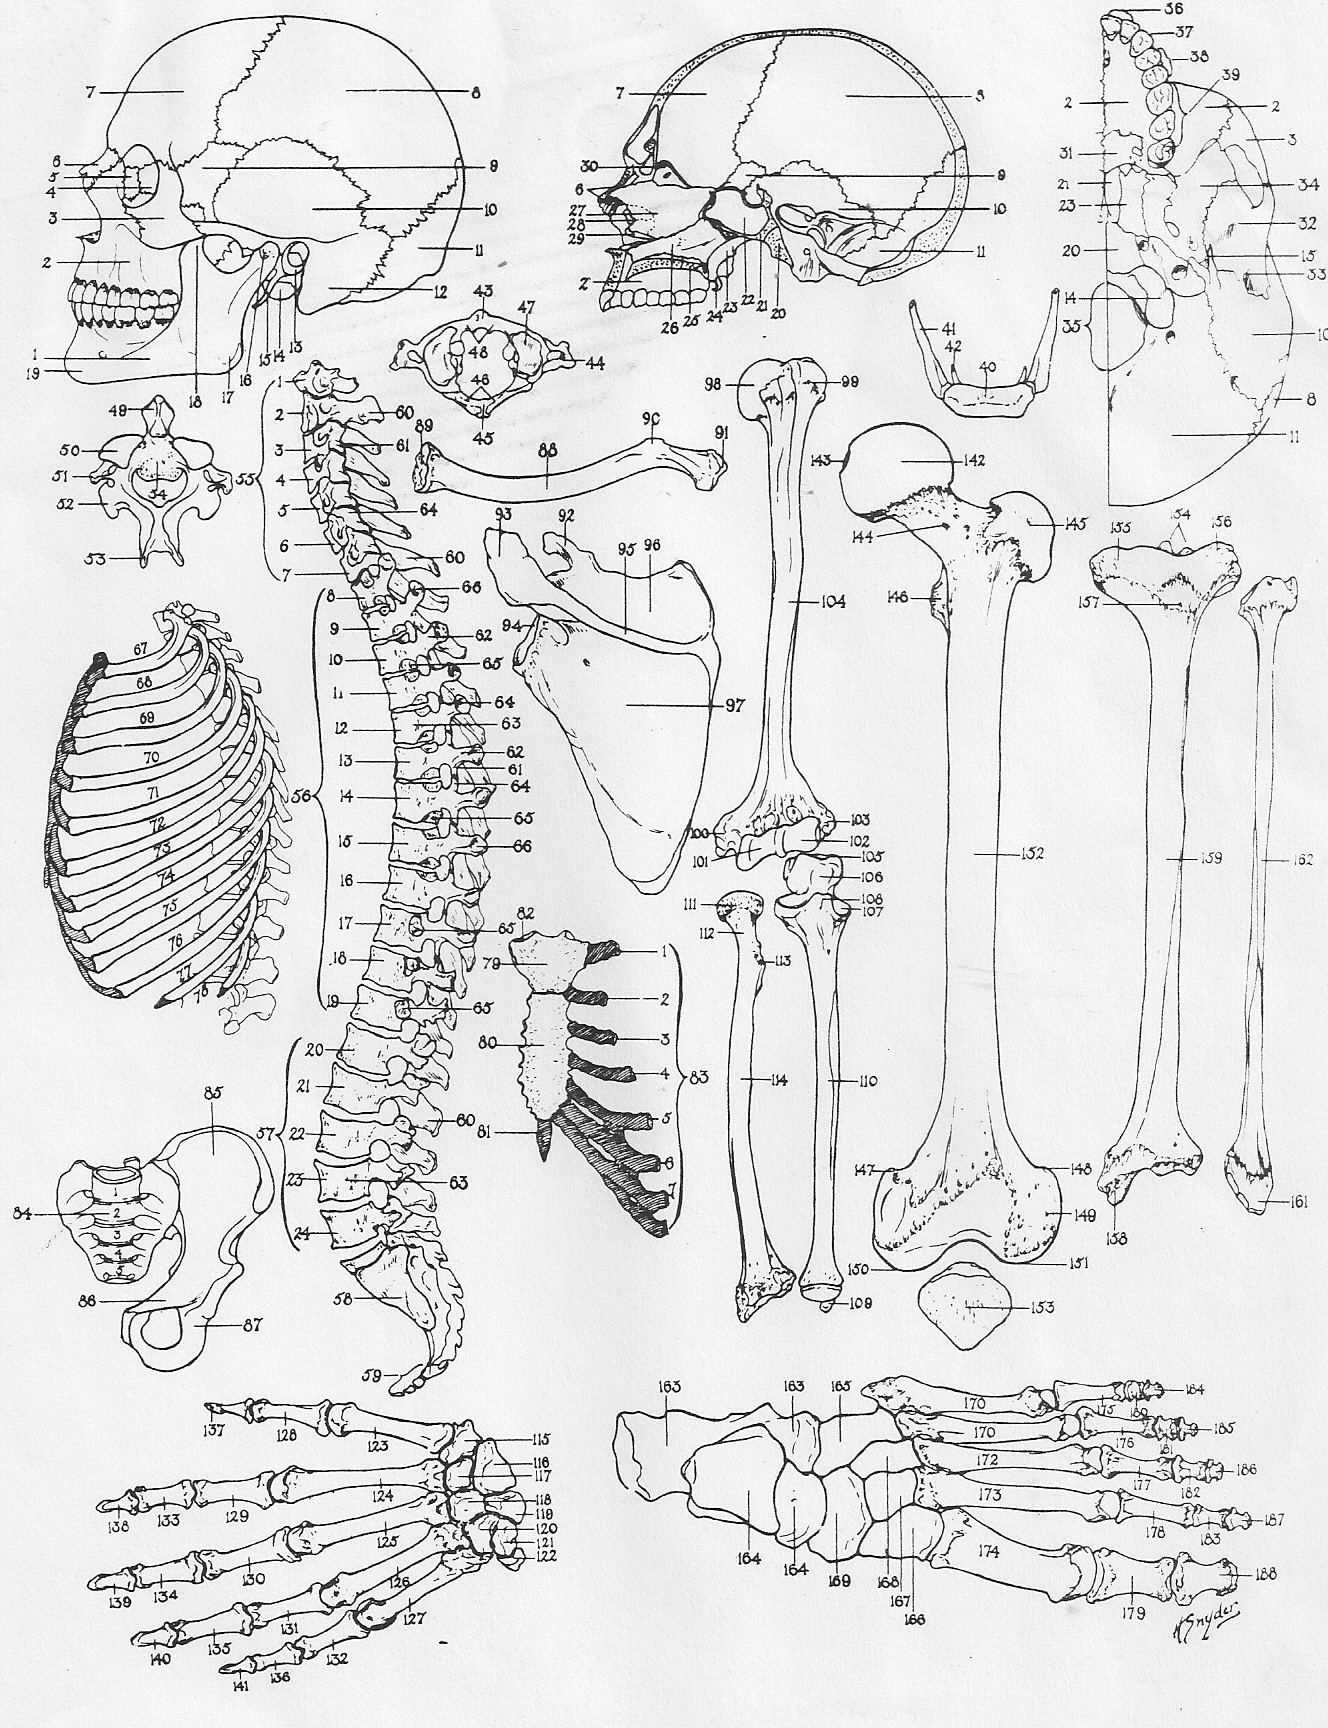 Human Anatomy Coloring Pages Printable At Getdrawings